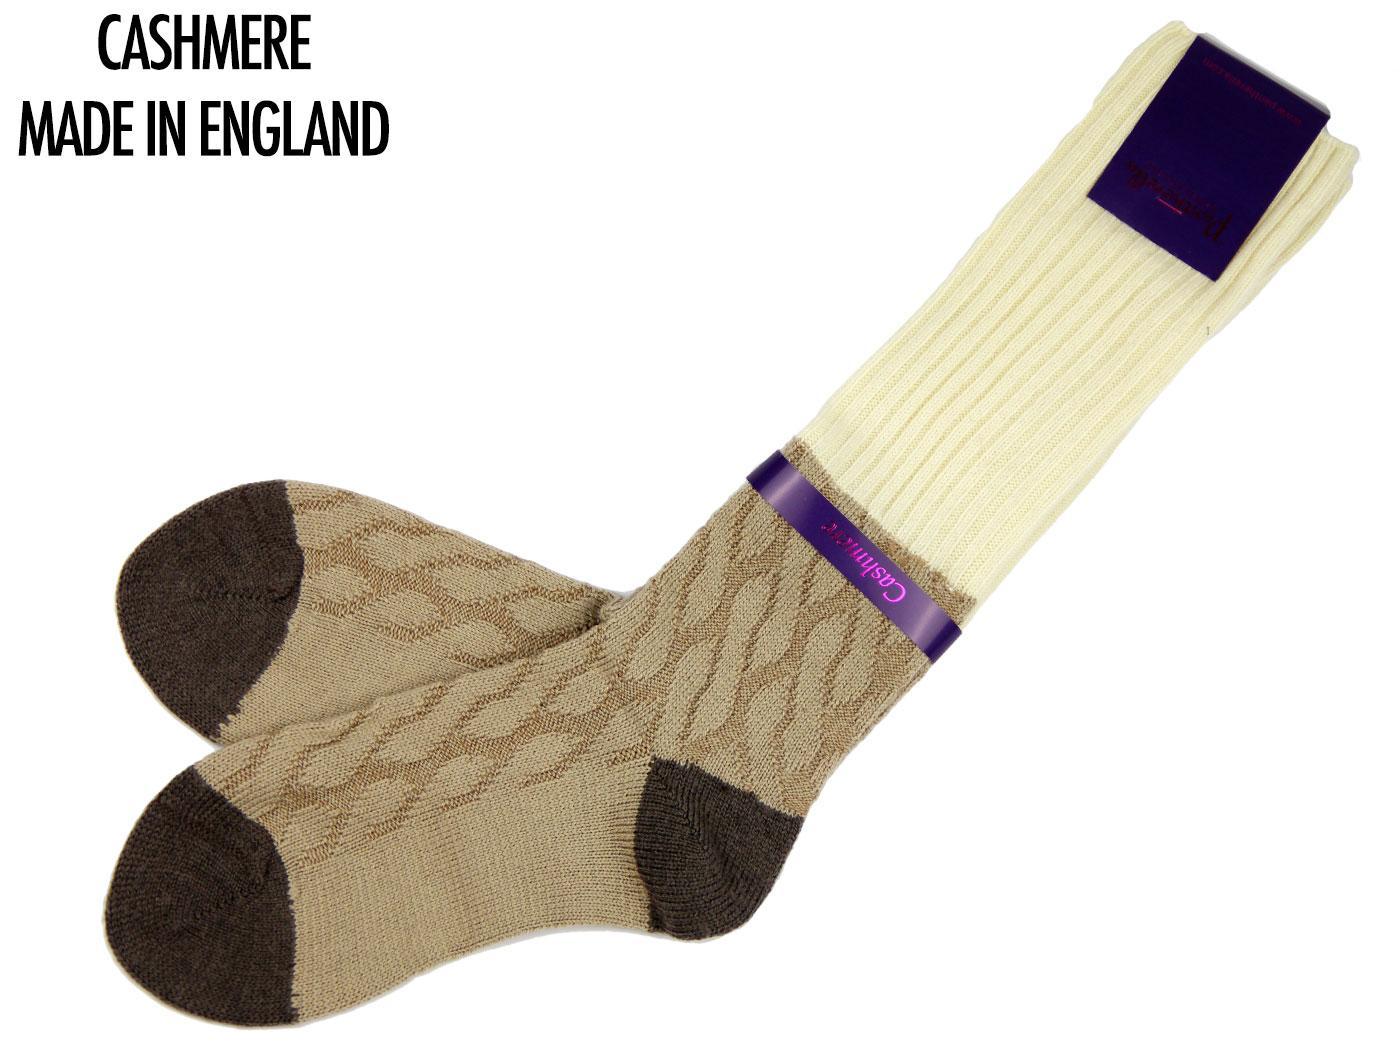 + Clara PANTHERELLA Retro Cashmere Knee High Socks